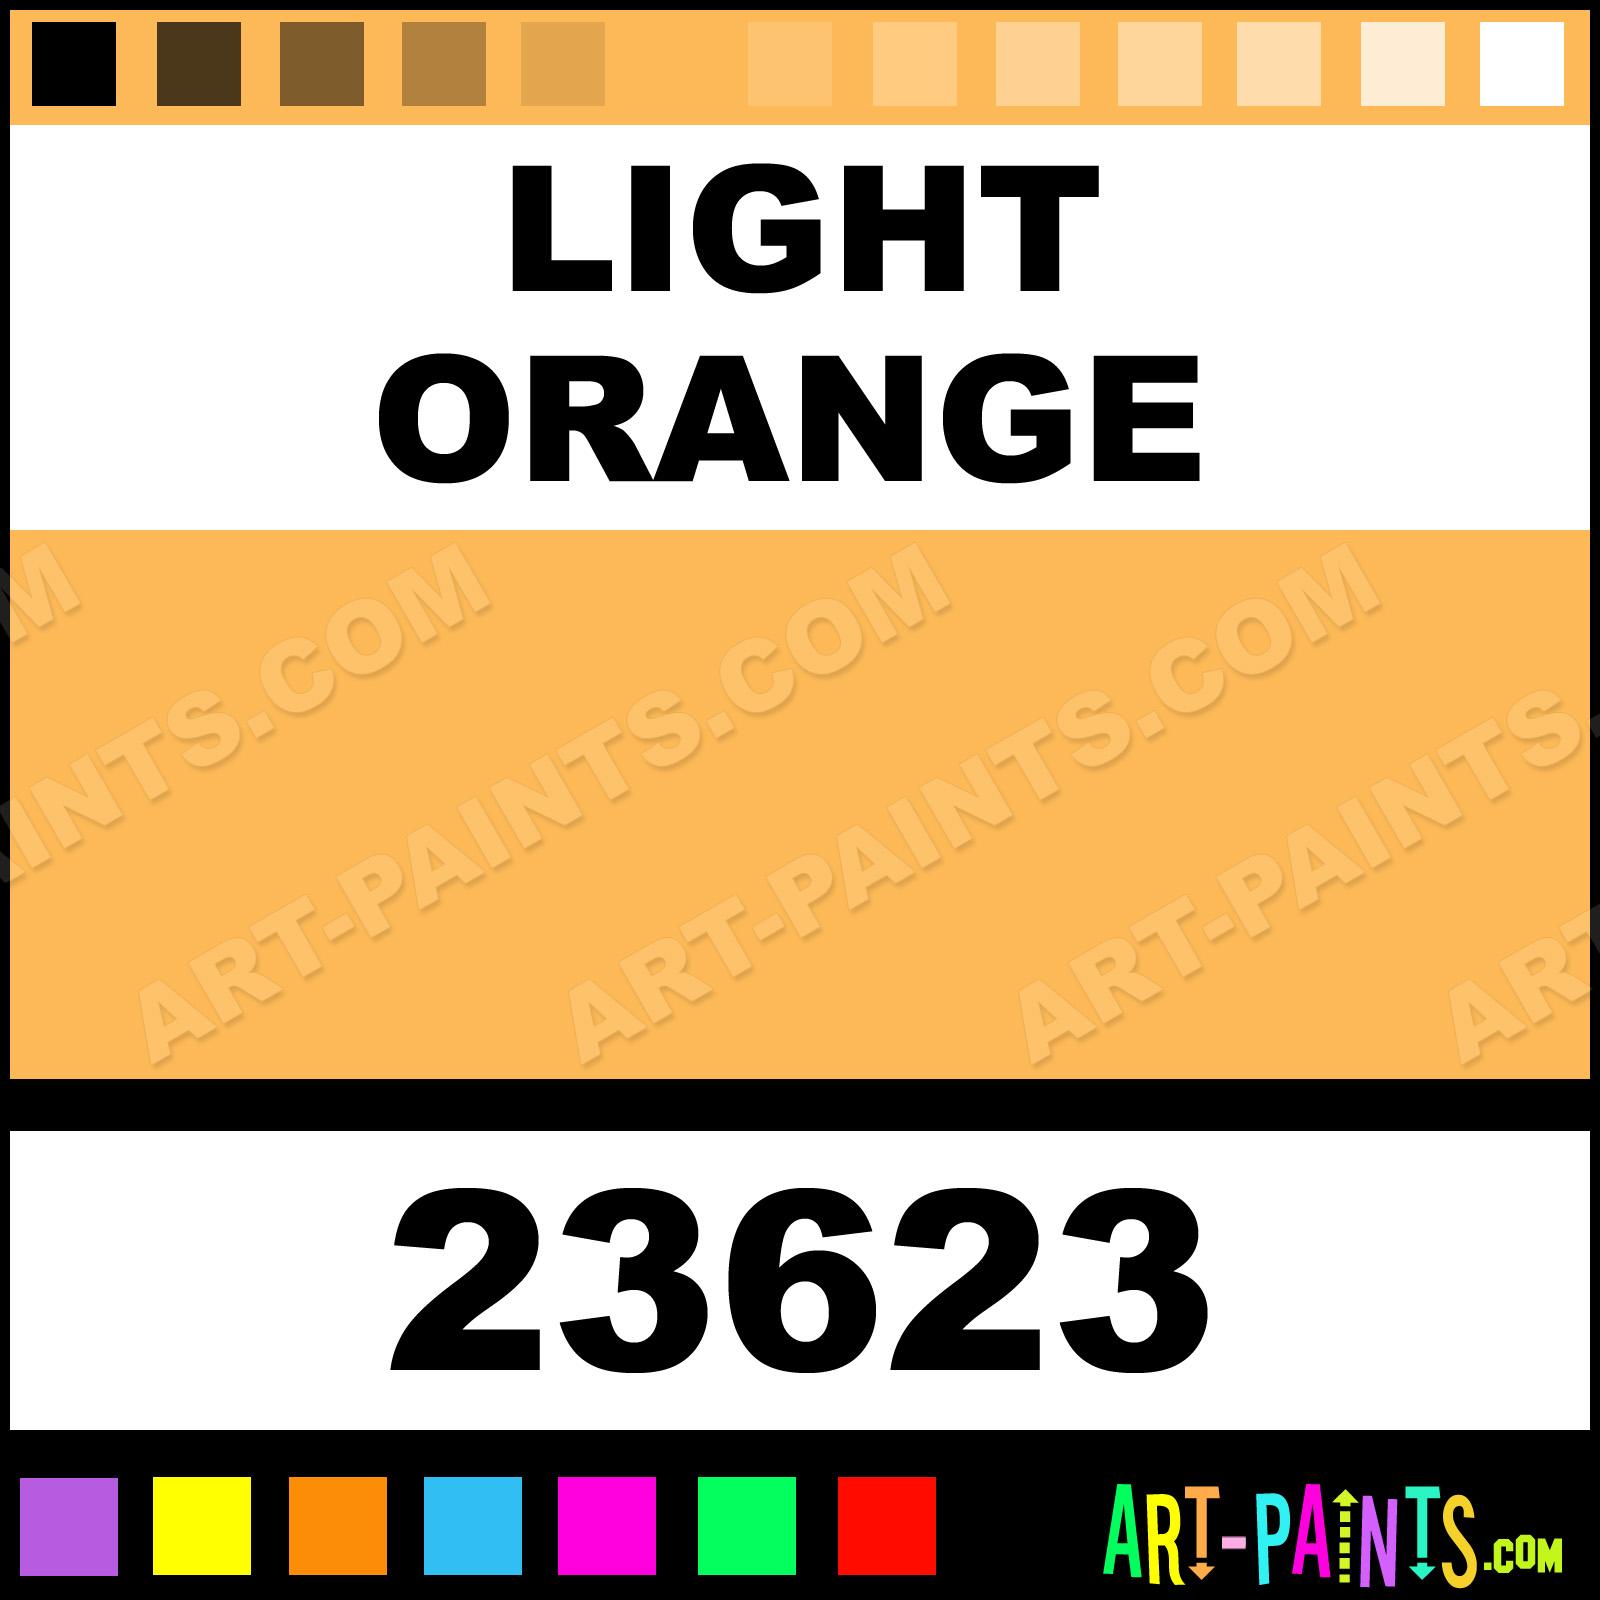 Light Orange Craft Smart Acrylic Paints - 23623 - Light